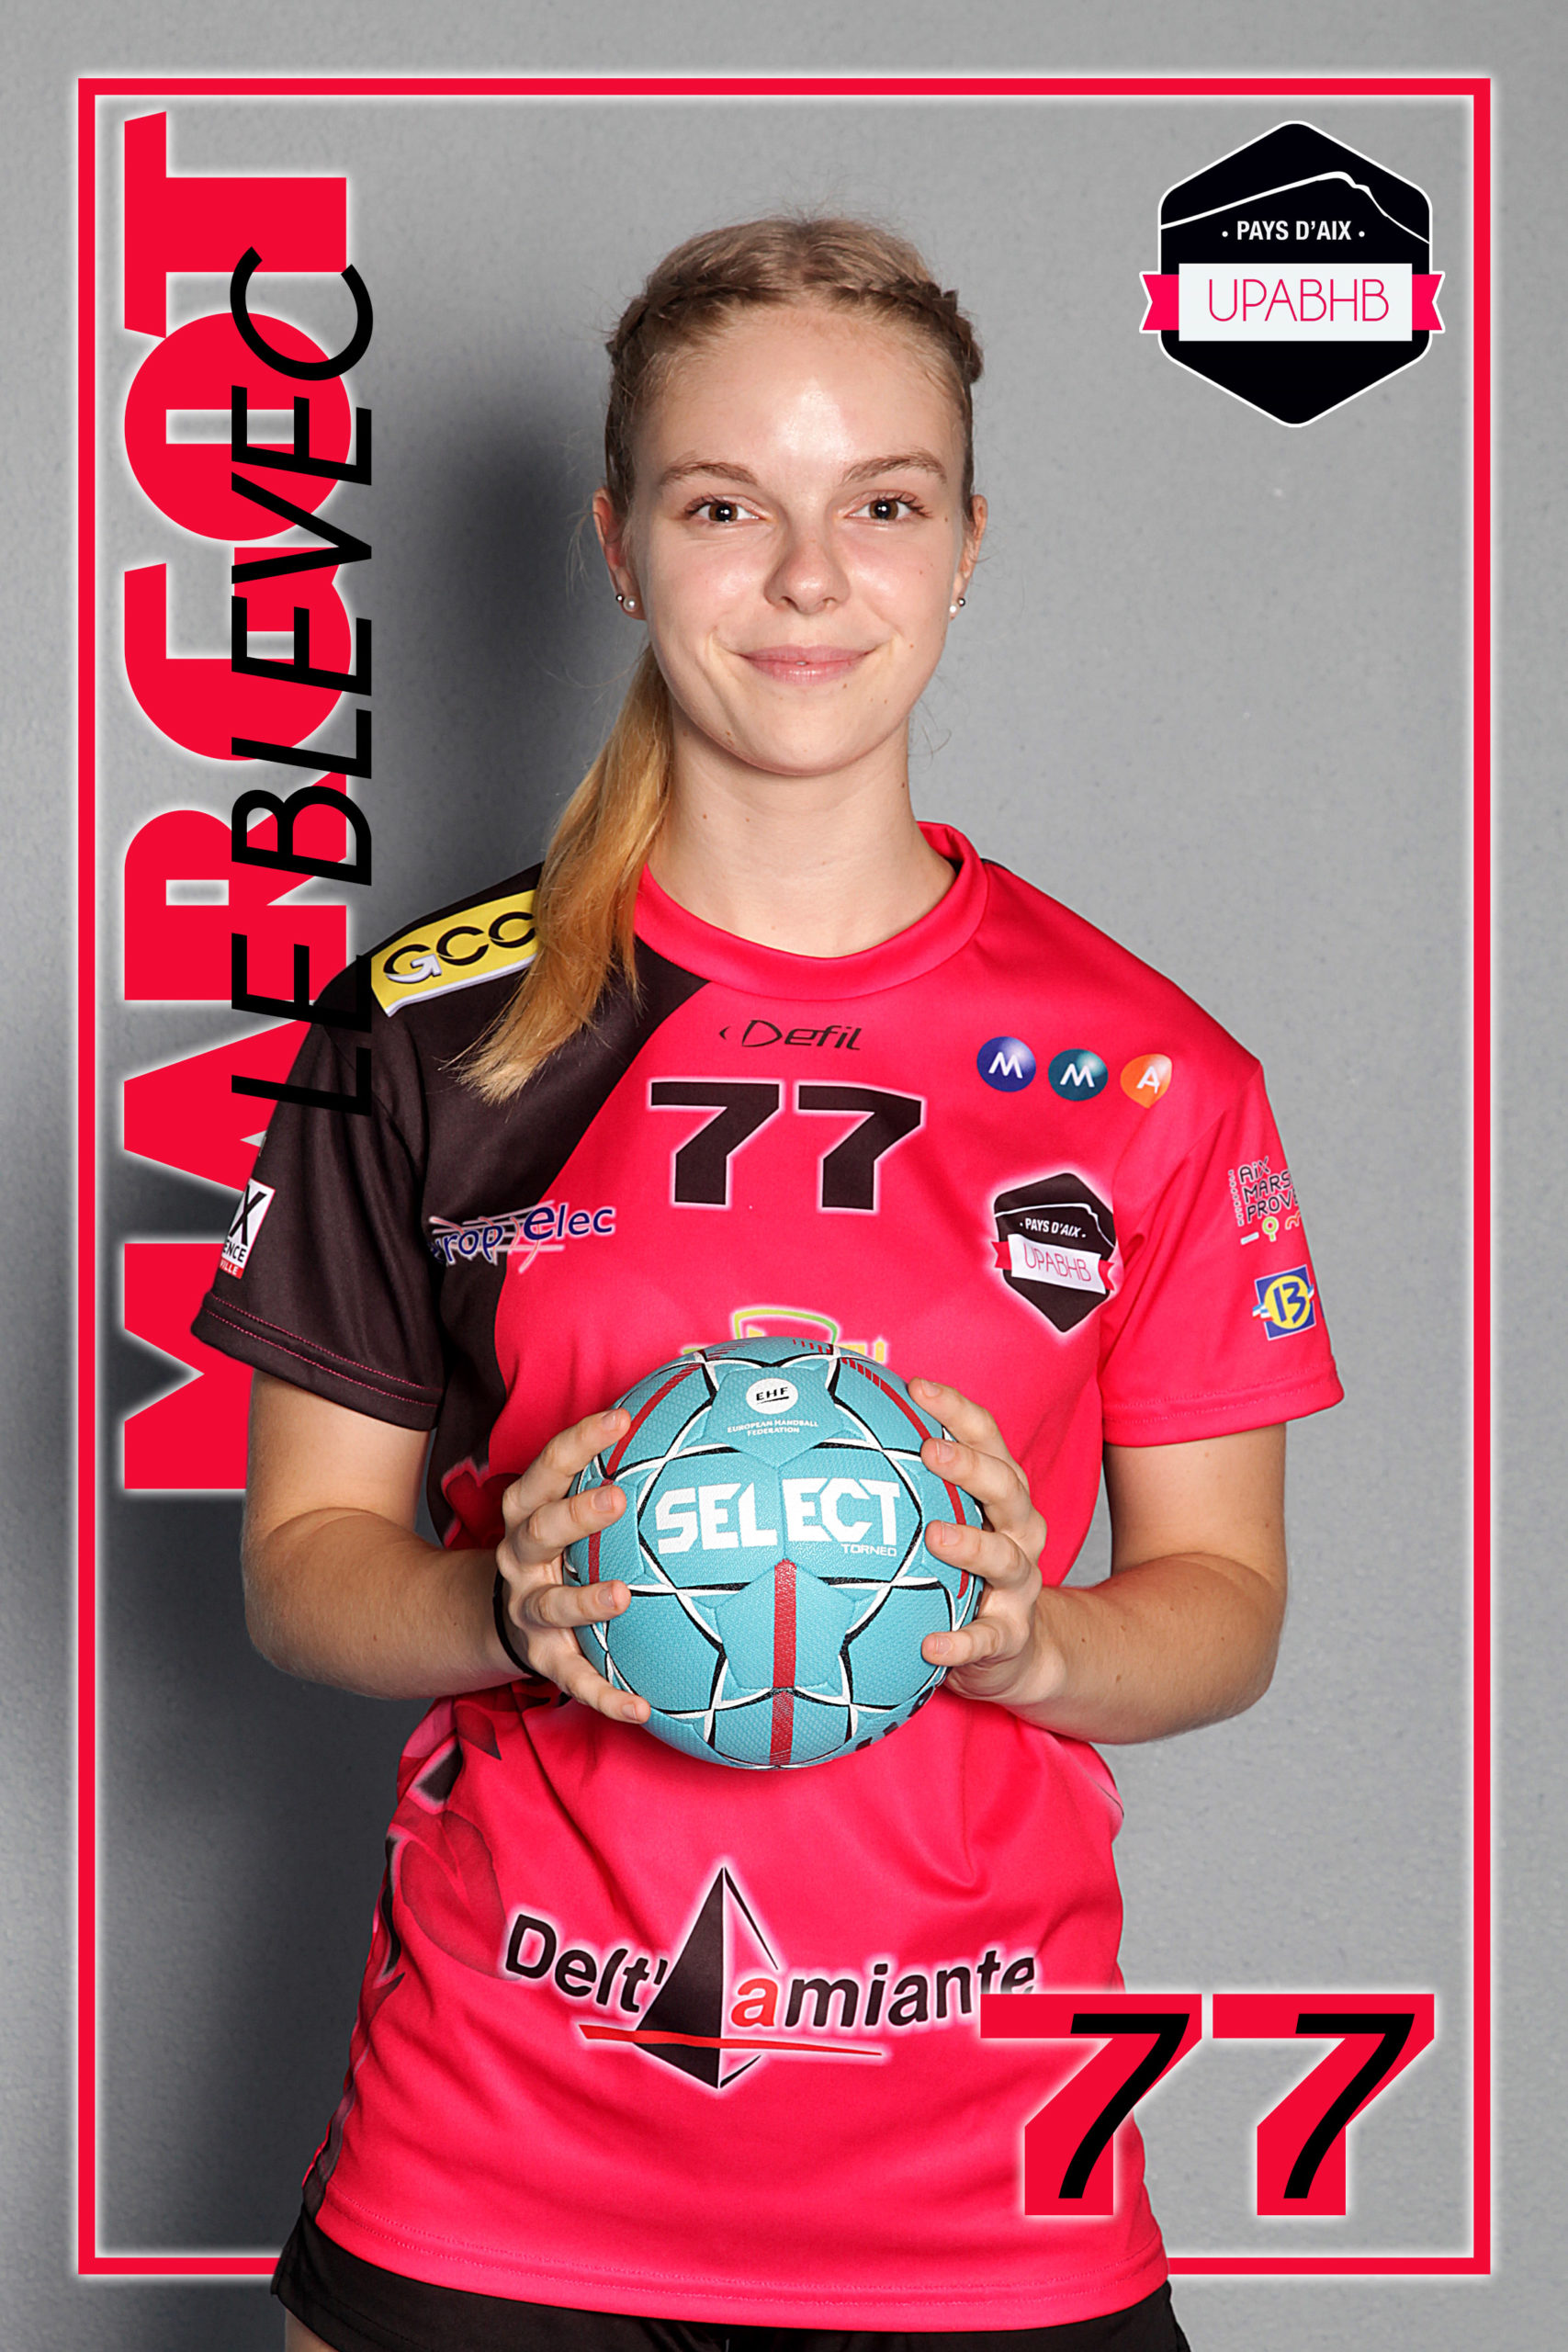 Margot Le Blevec UPABHB